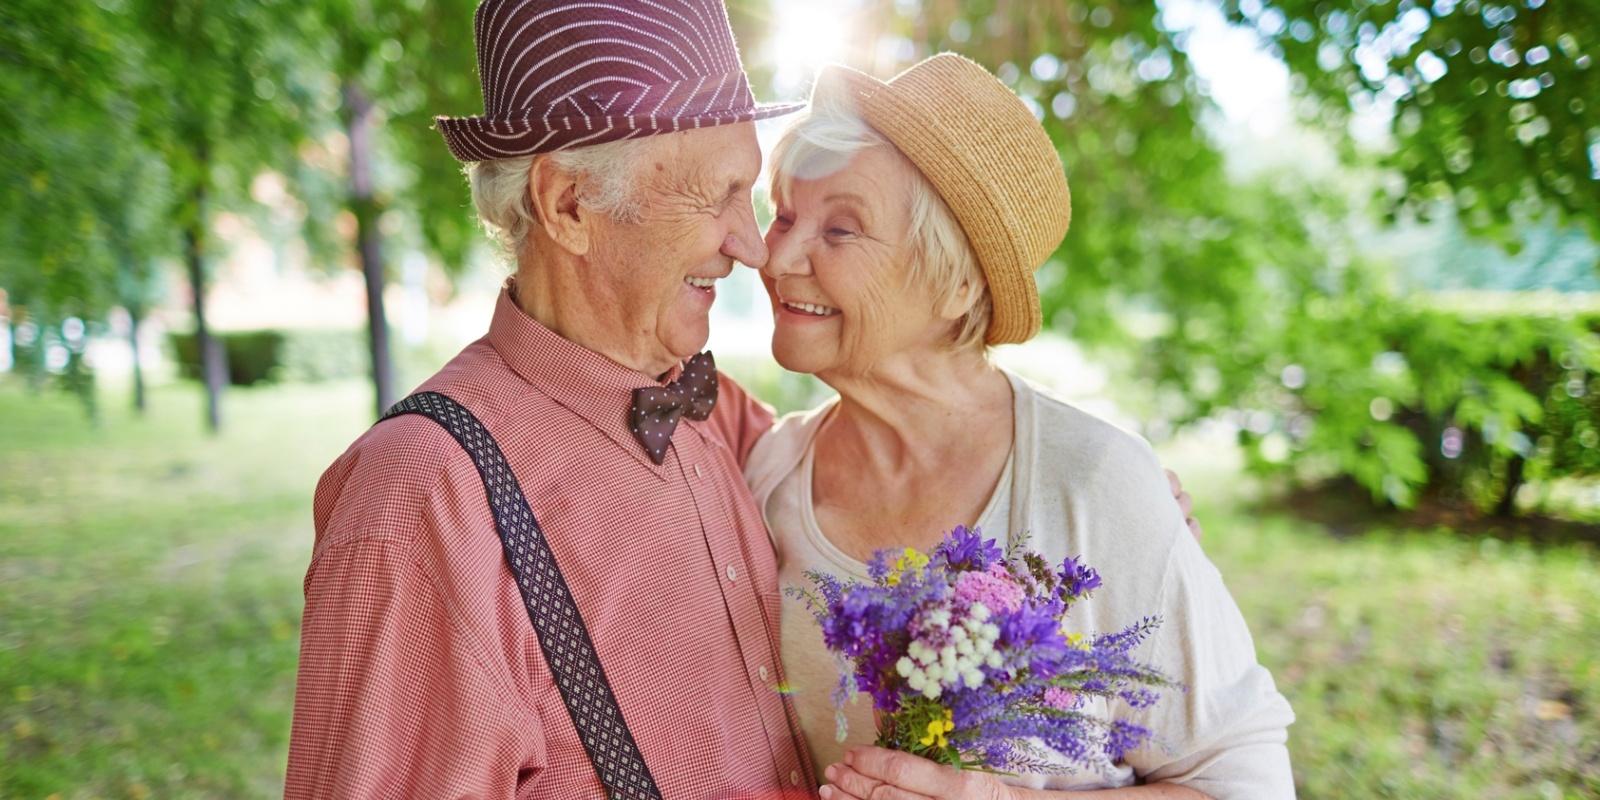 Dating fГјr reiche Fachleute